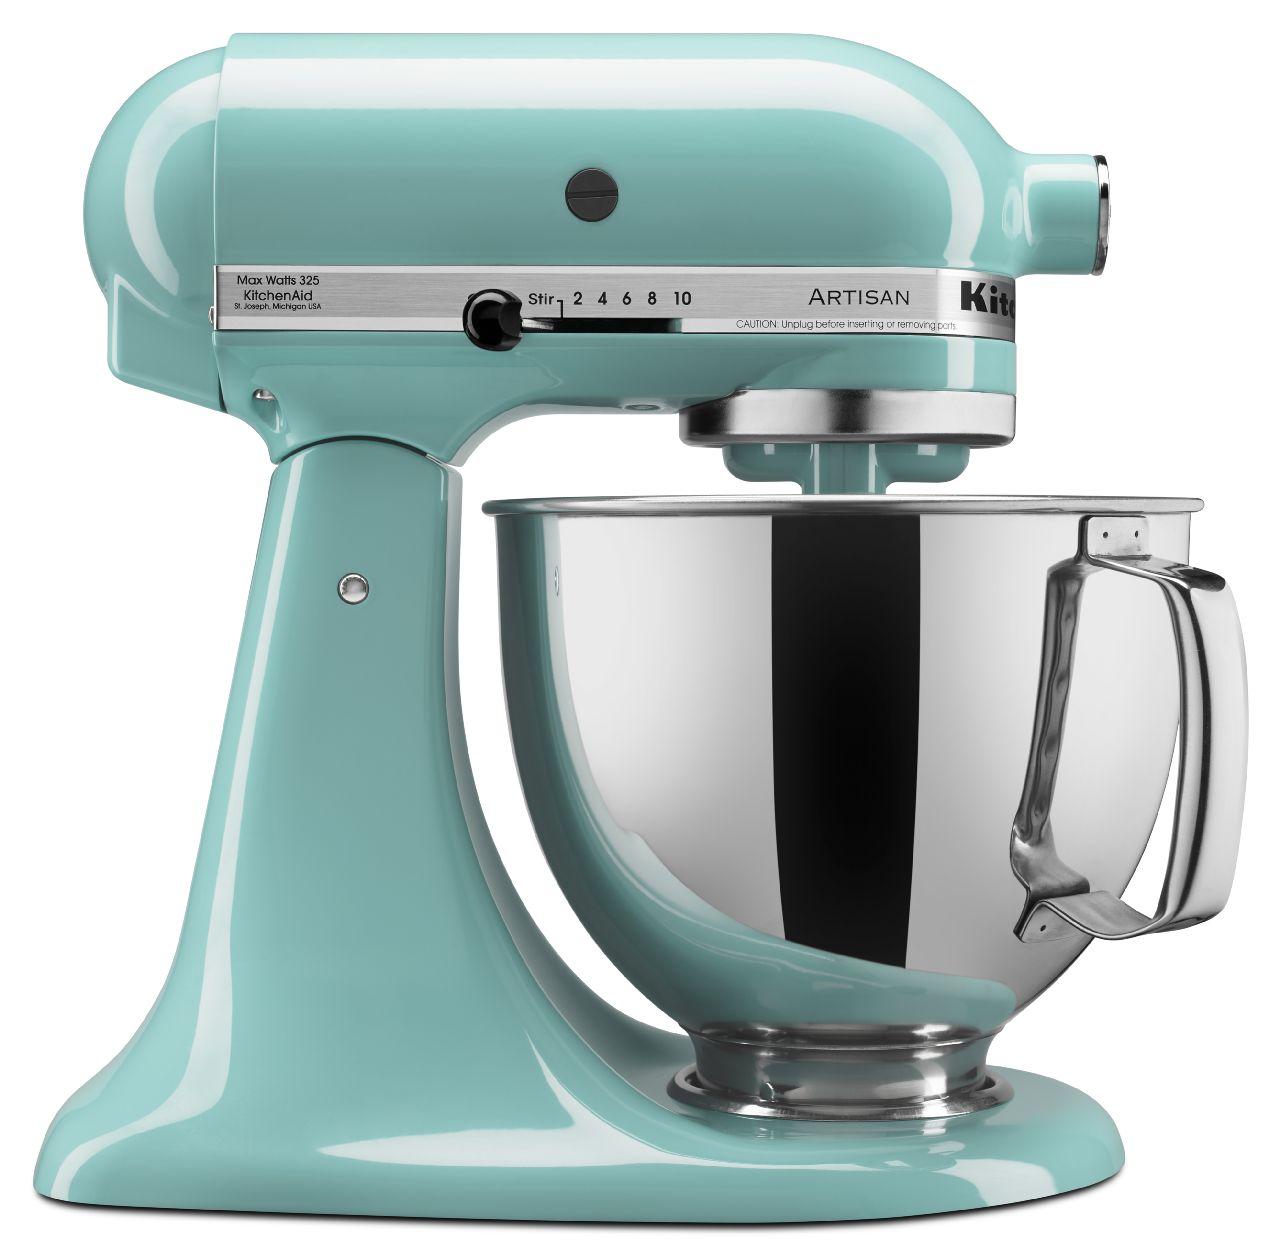 KitchenAid-Artisan-Series-5-Quart-Tilt-Head-Stand-Mixer-10-Speeds-KSM150PS thumbnail 16